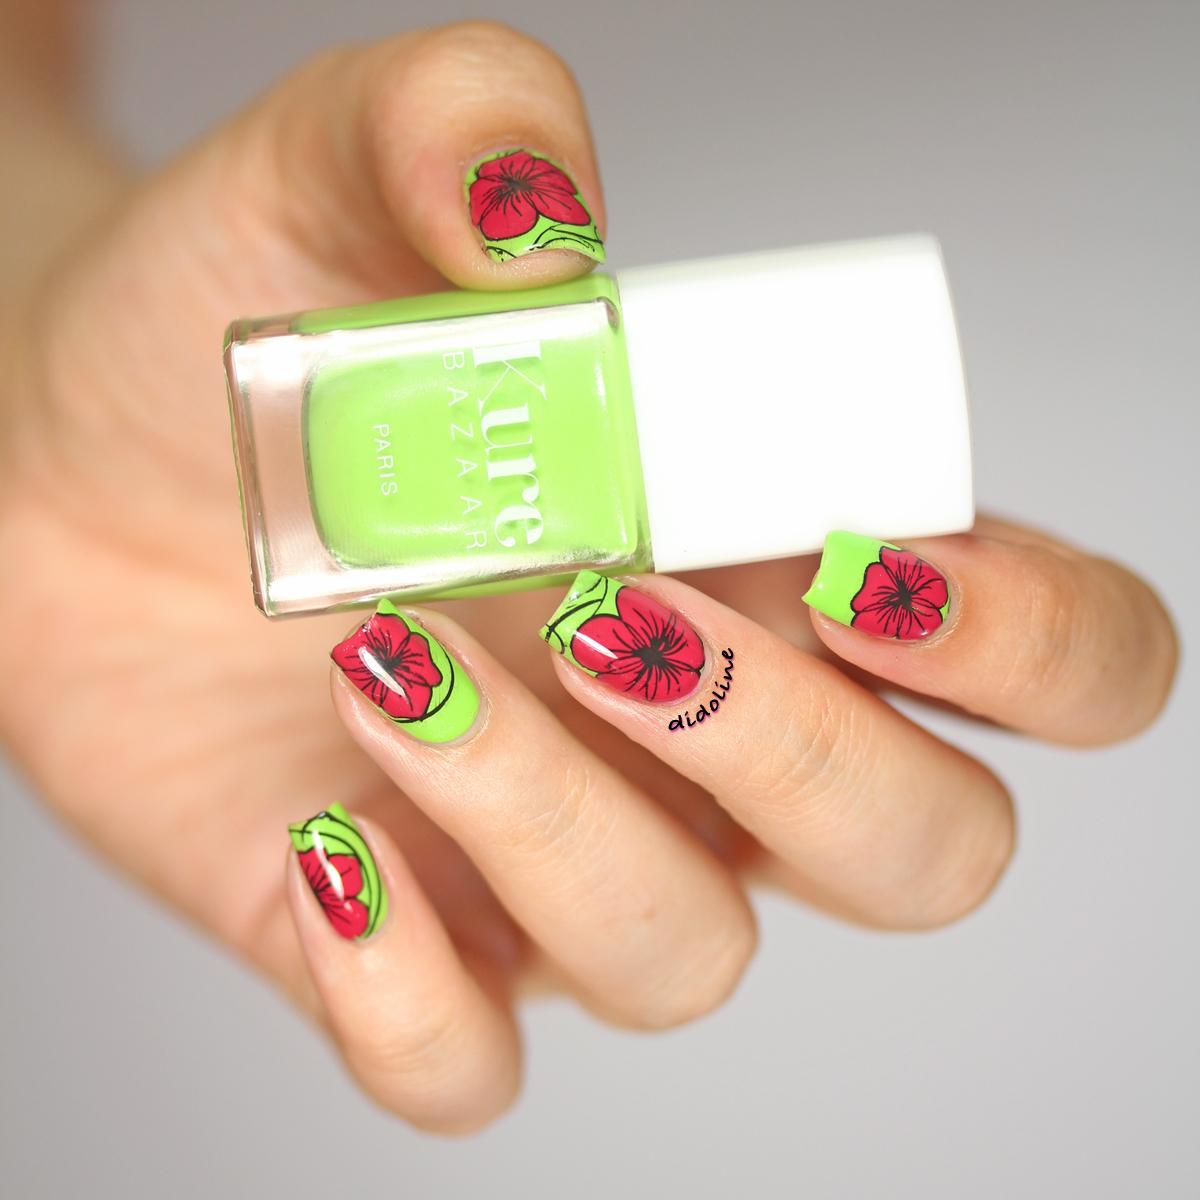 Nail Art Fleuri - Stamping Inversé - Reverse Stamping - Kure Bazaar - Carioca - Pueen